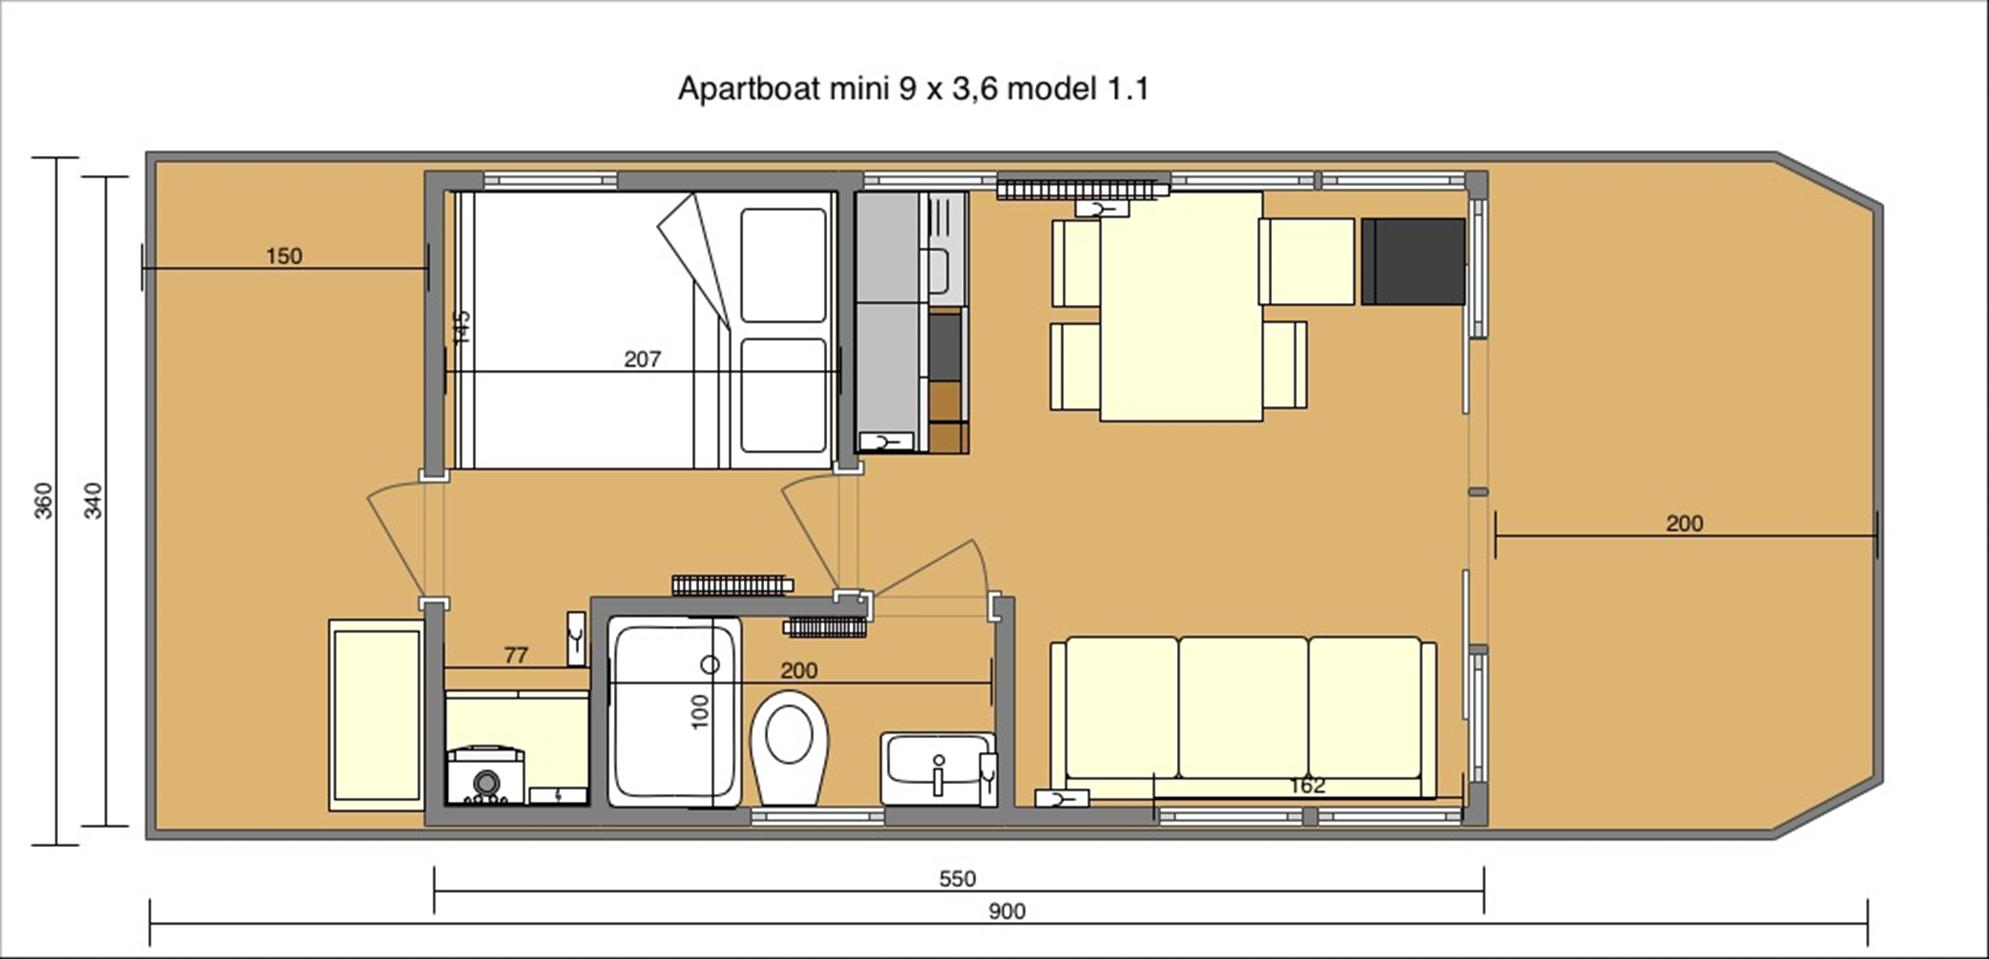 apart m layout